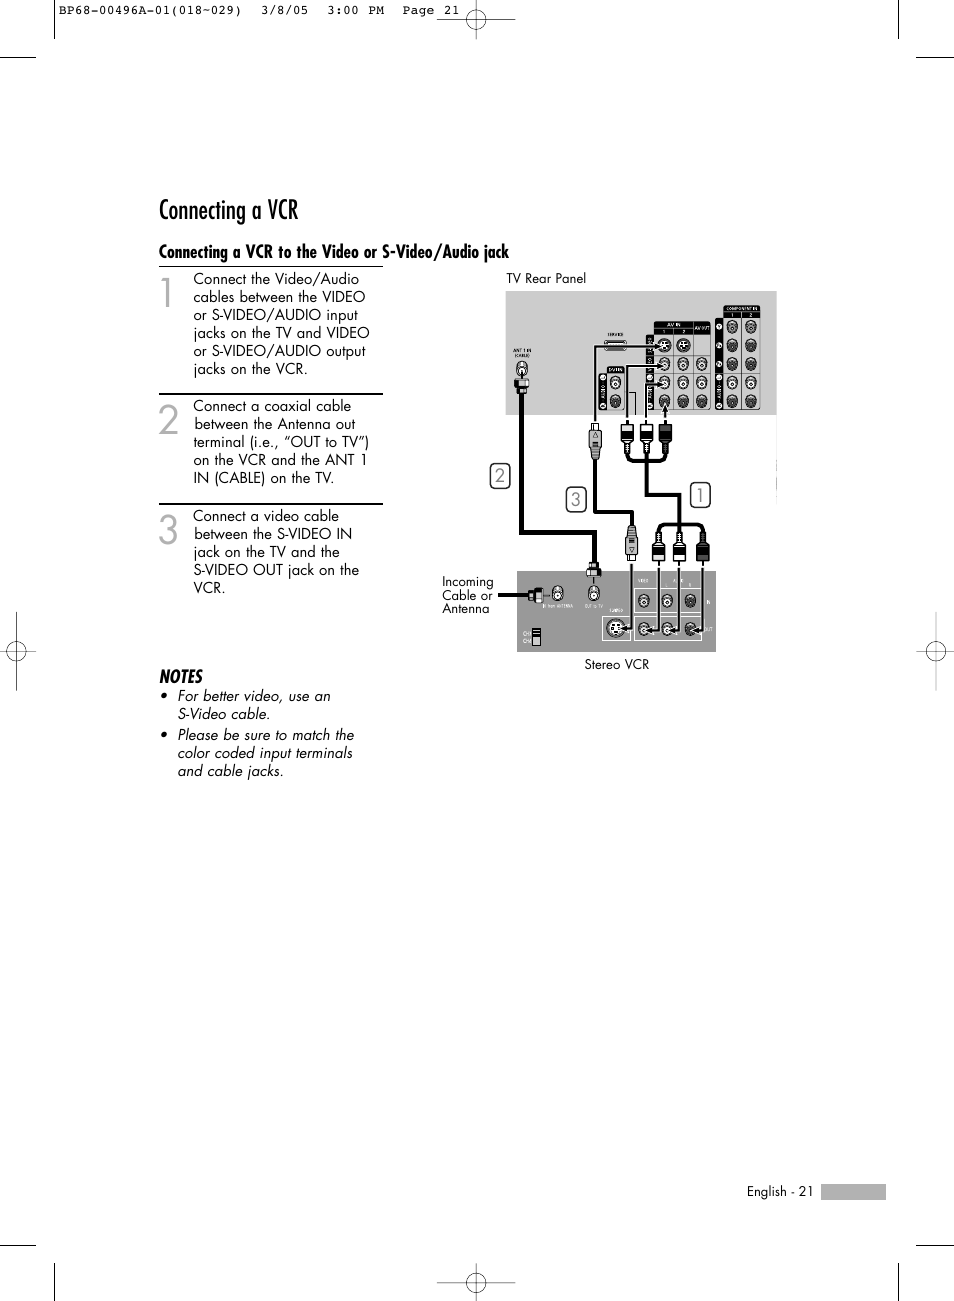 connecting a vcr samsung hlr4266wx xaa user manual page 21 108 rh manualsdir com